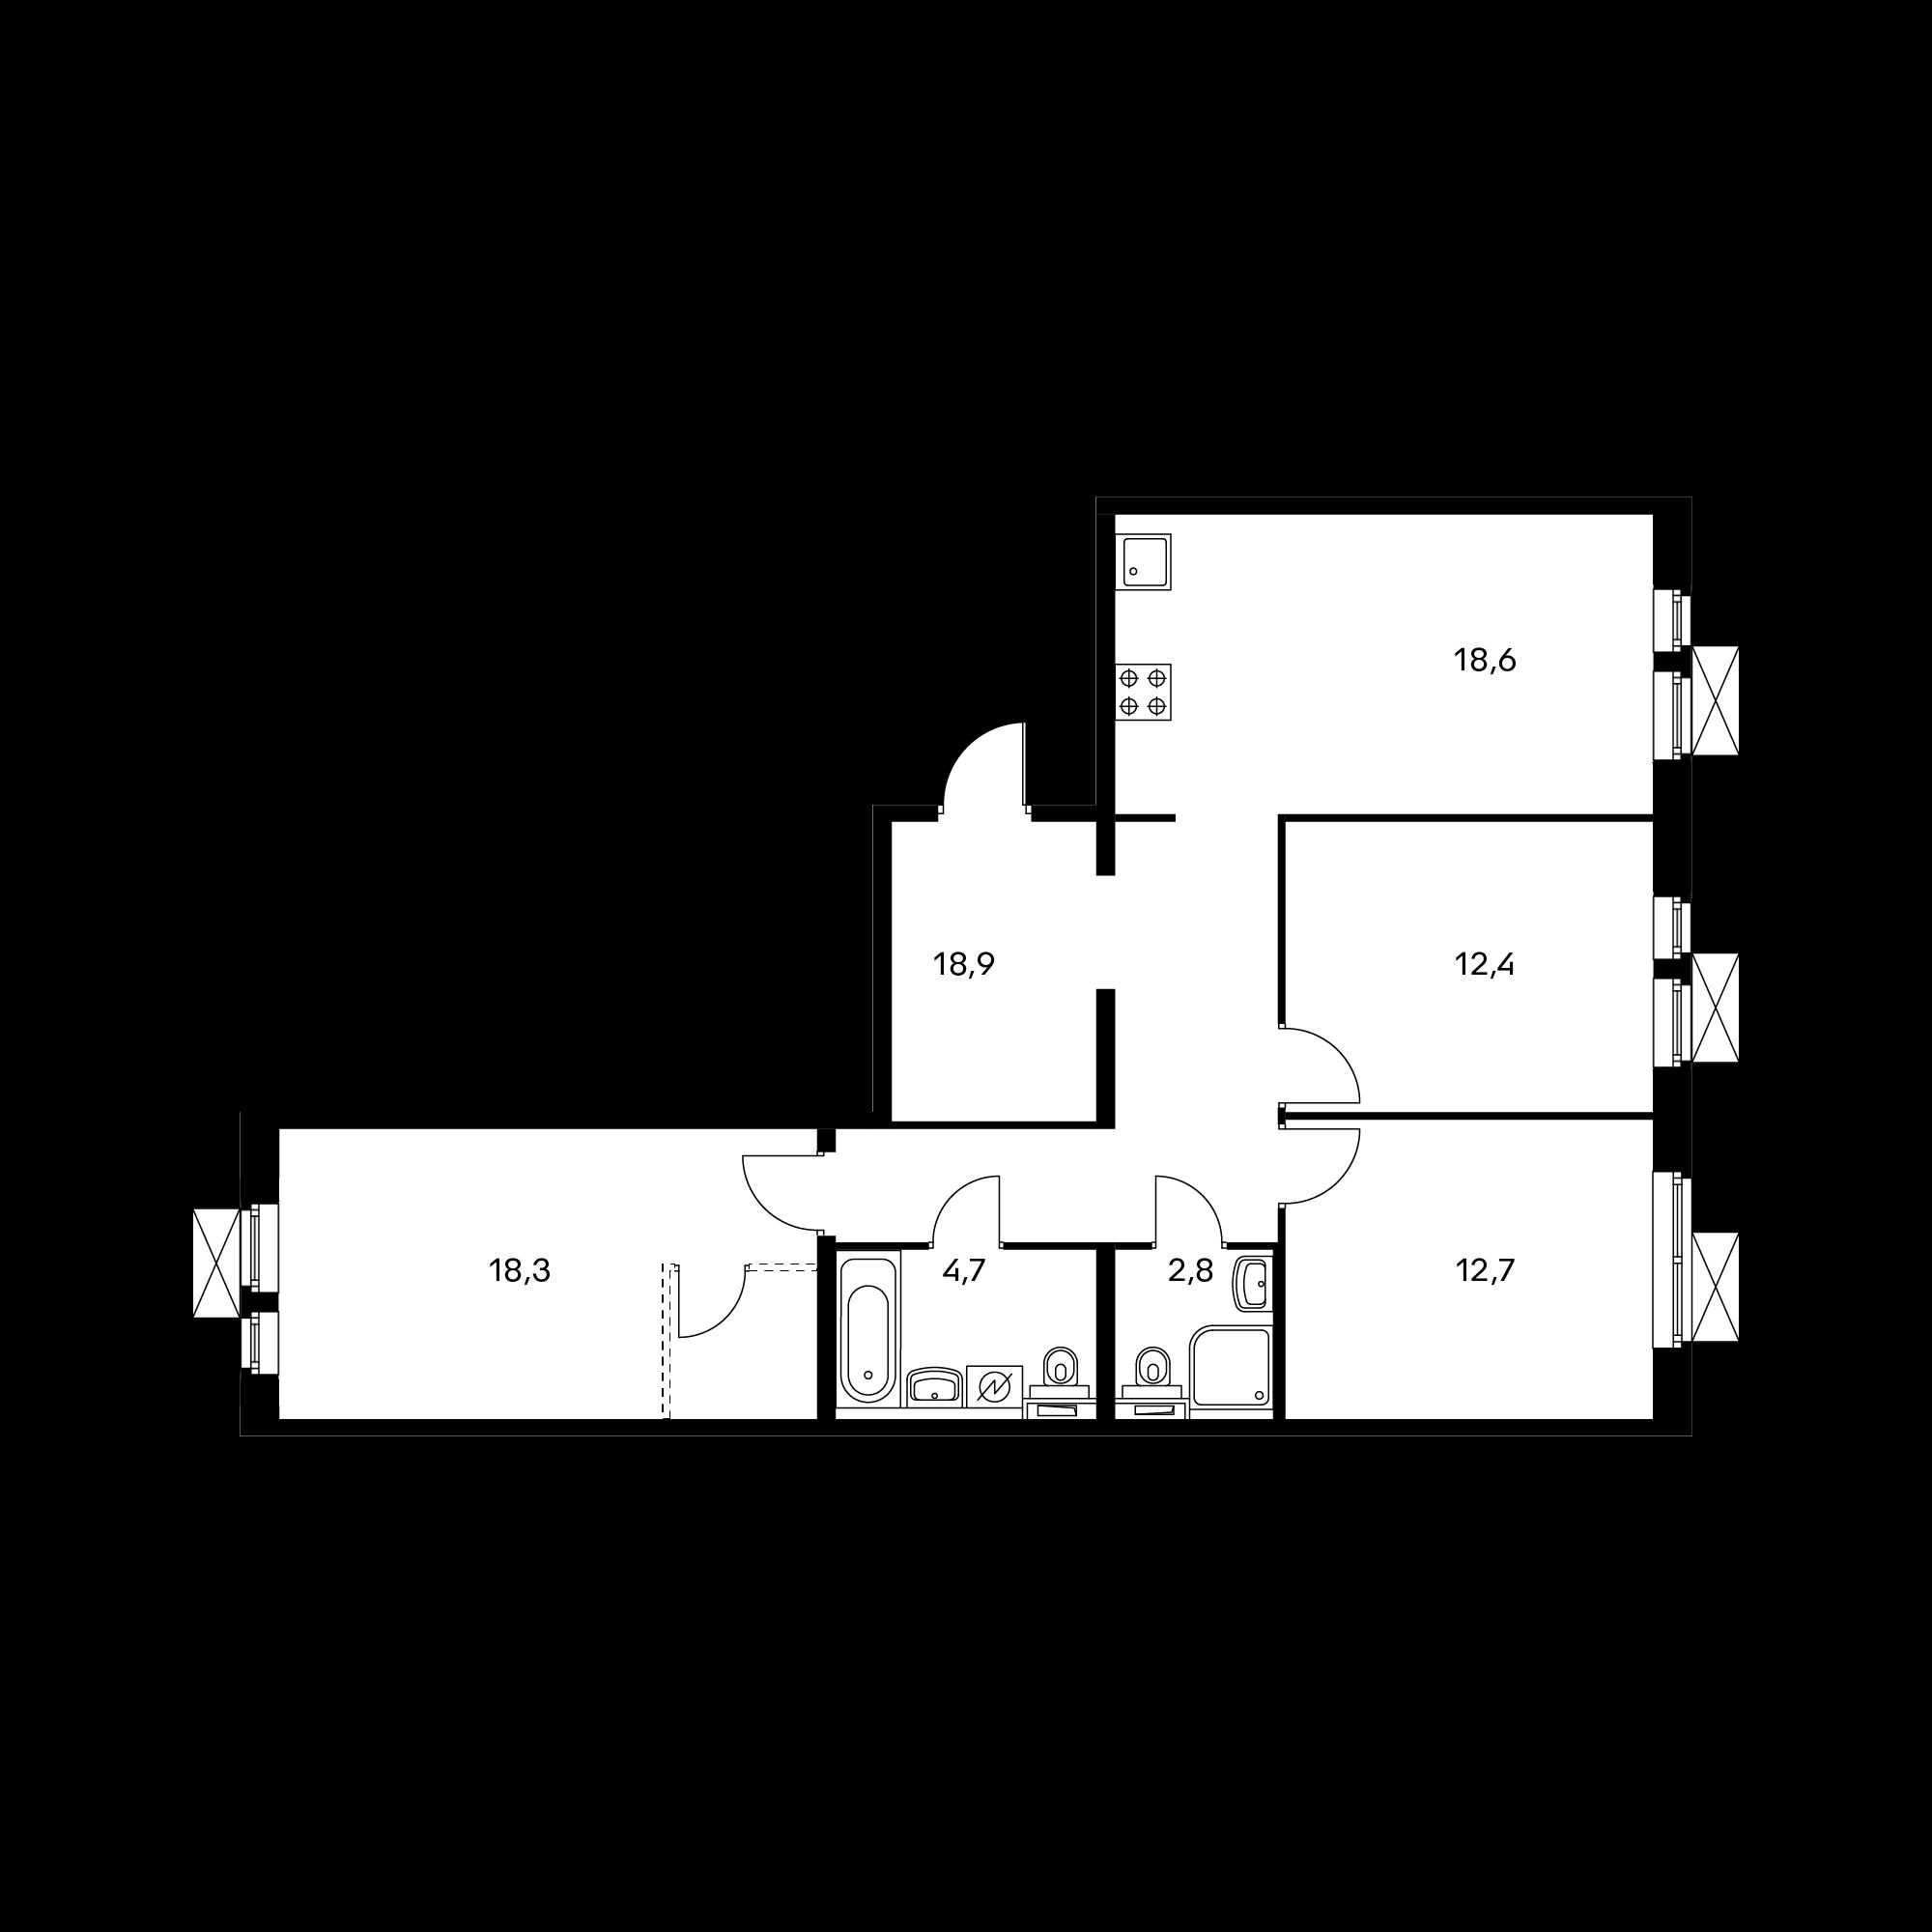 3EL3_9.9-7*